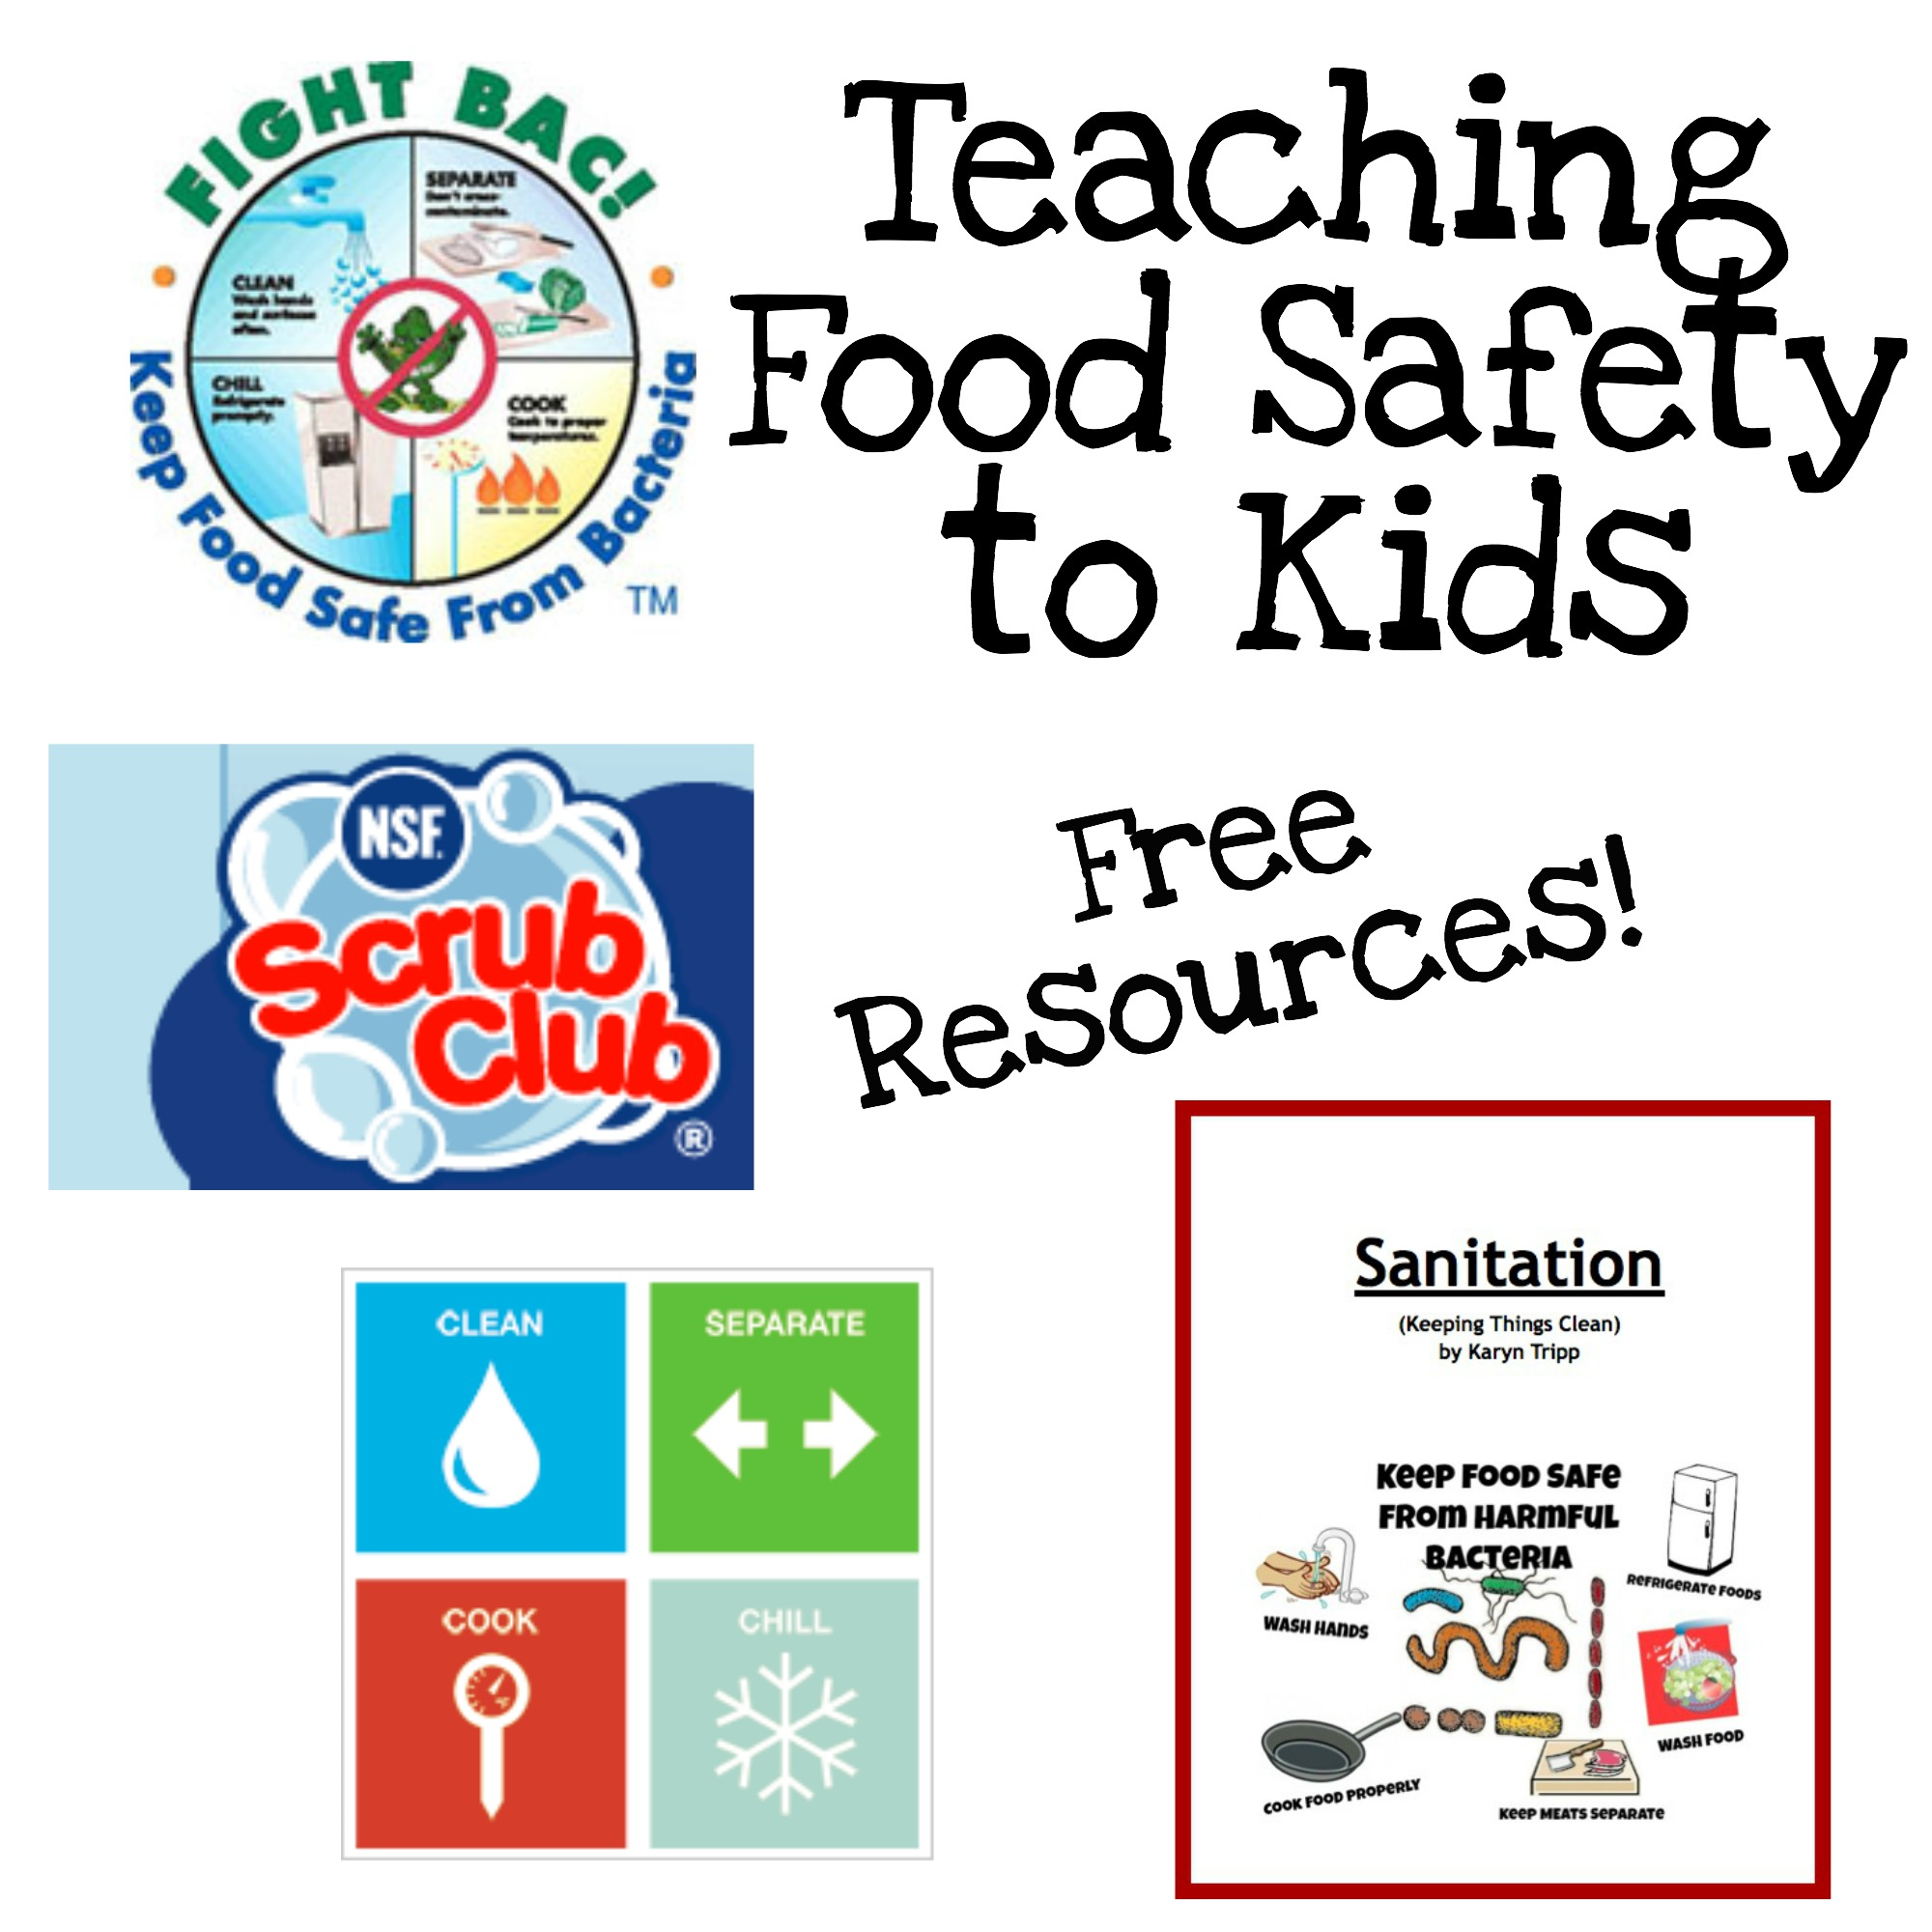 Kitchen Safety For Kids Worksheets: Fun Ways To Teach Food Safety